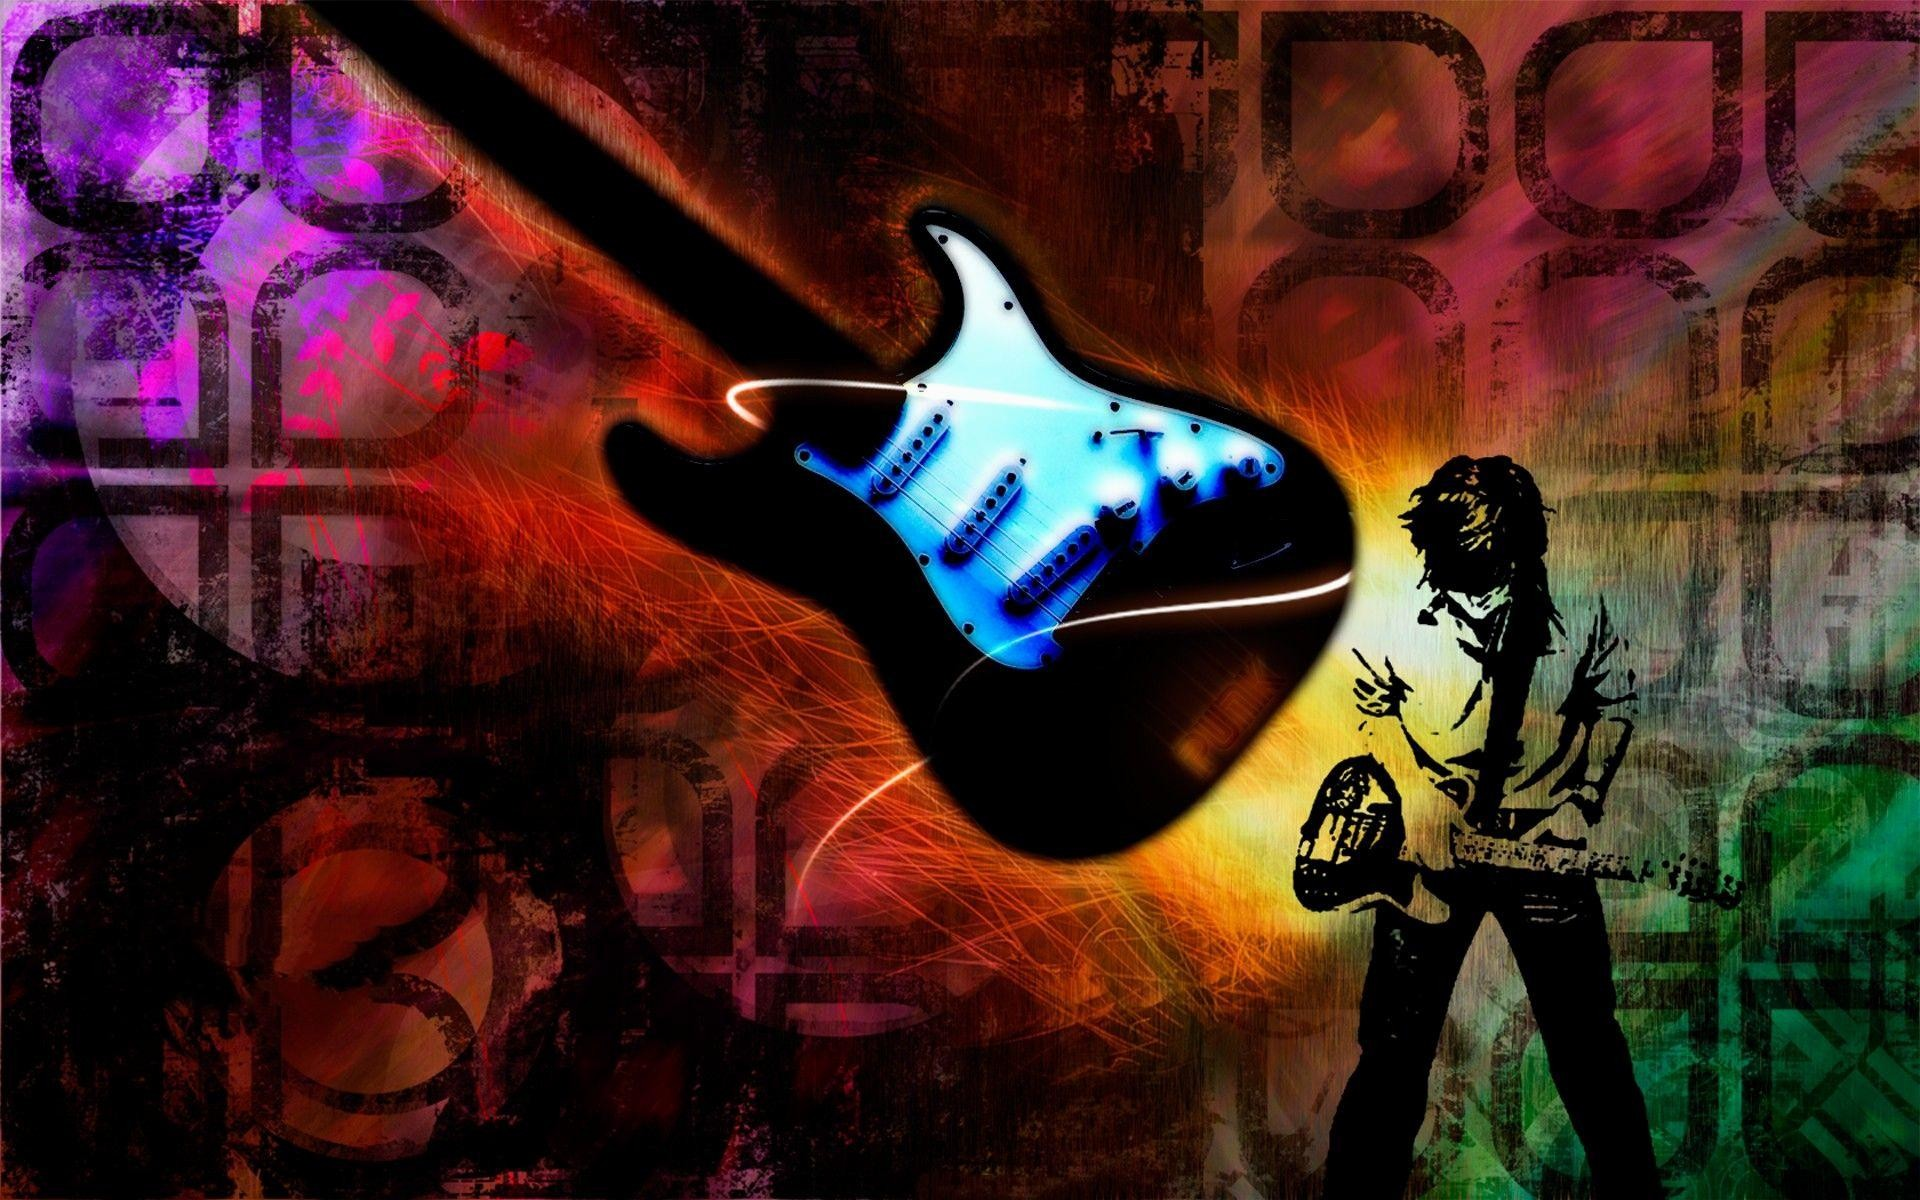 wallpaper.wiki-Punk-Rock-Background-PIC-WPD001233